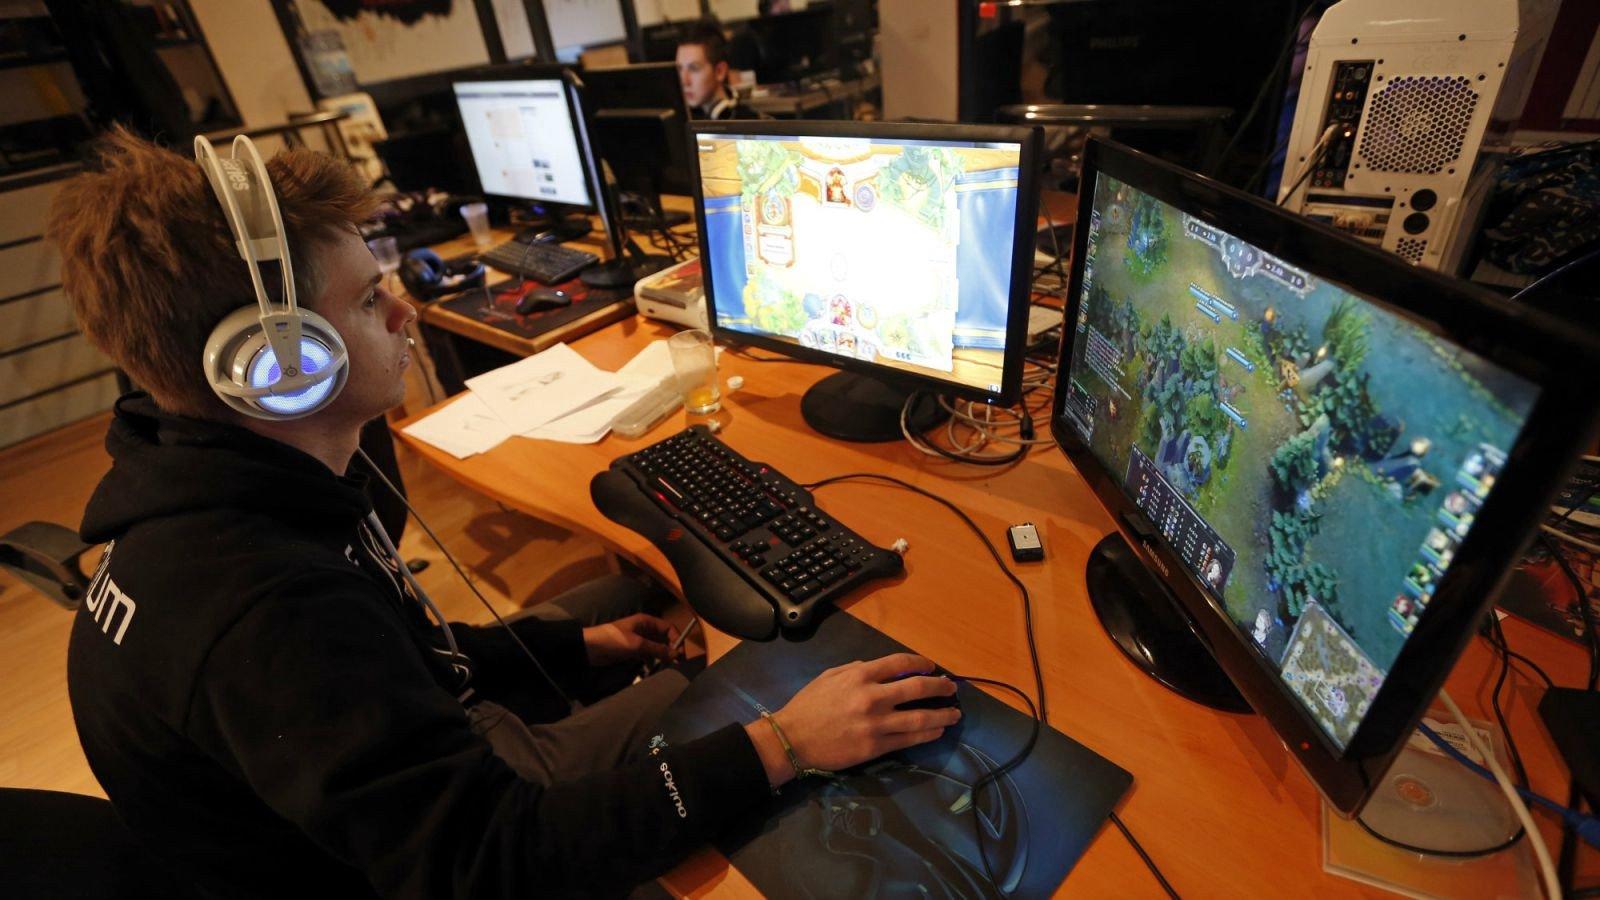 benifits of video games essay